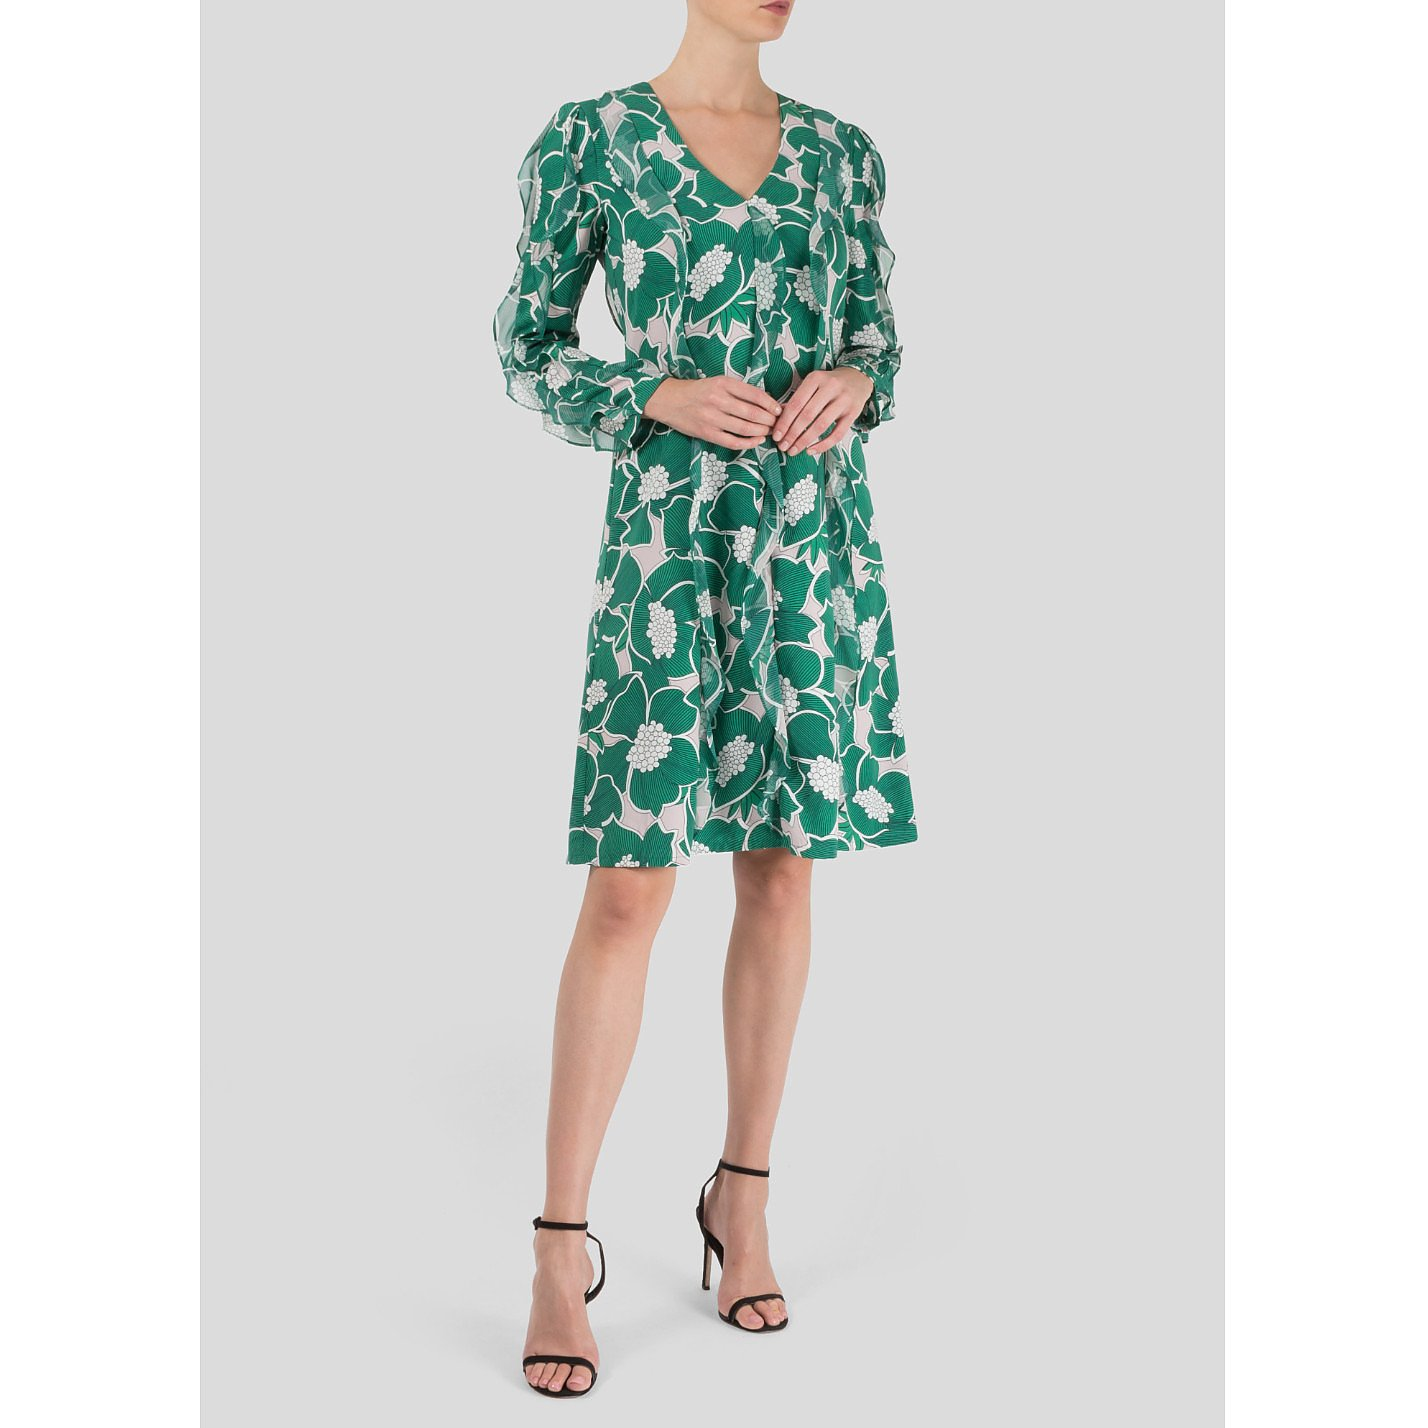 Starsica Patterned Dress